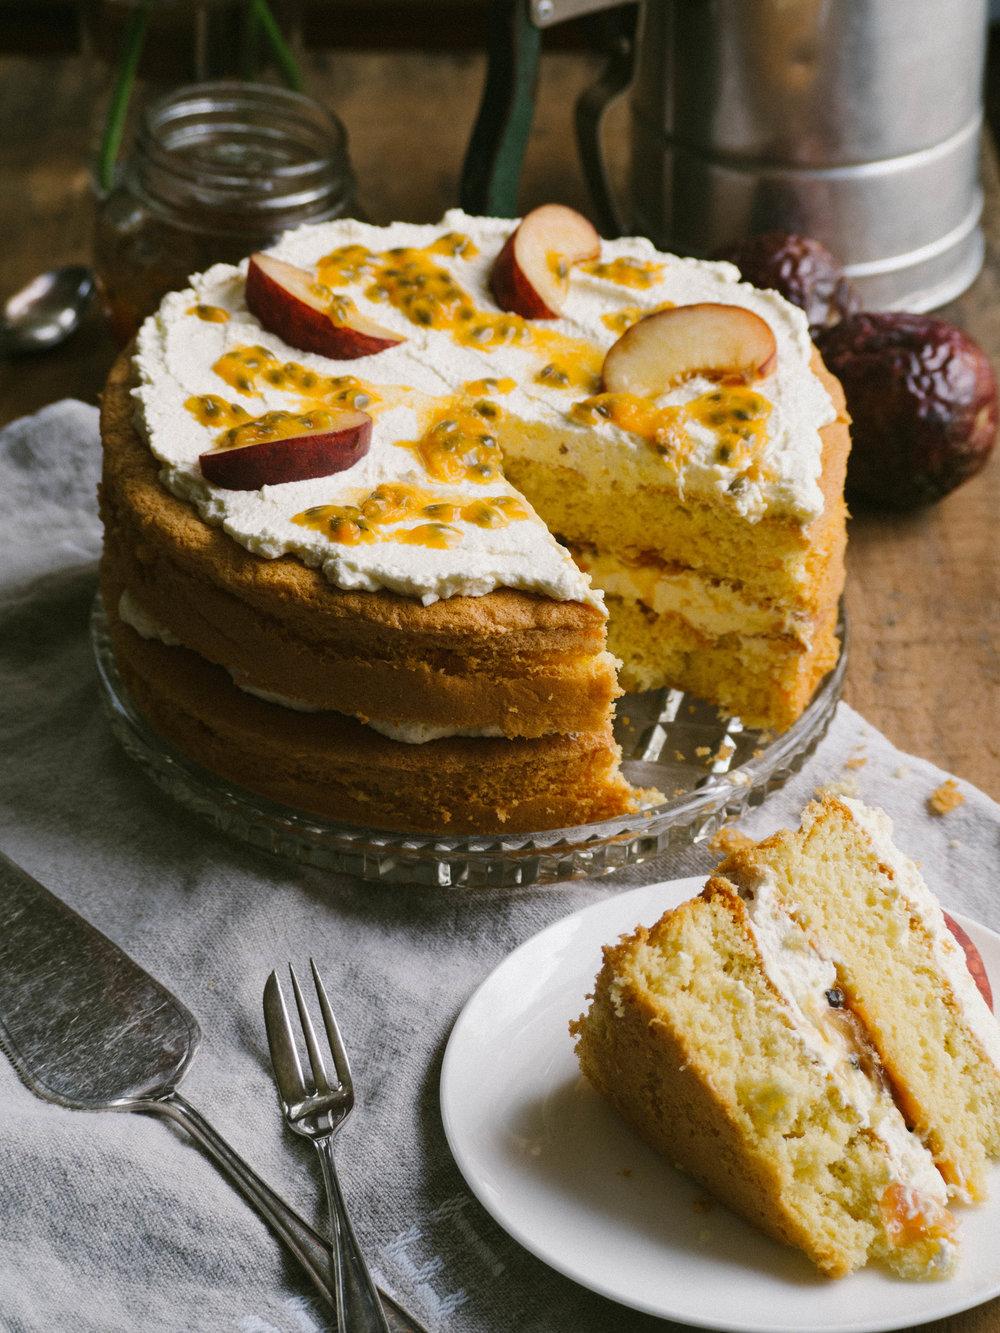 White Peach & Passionfruit Sponge Cake